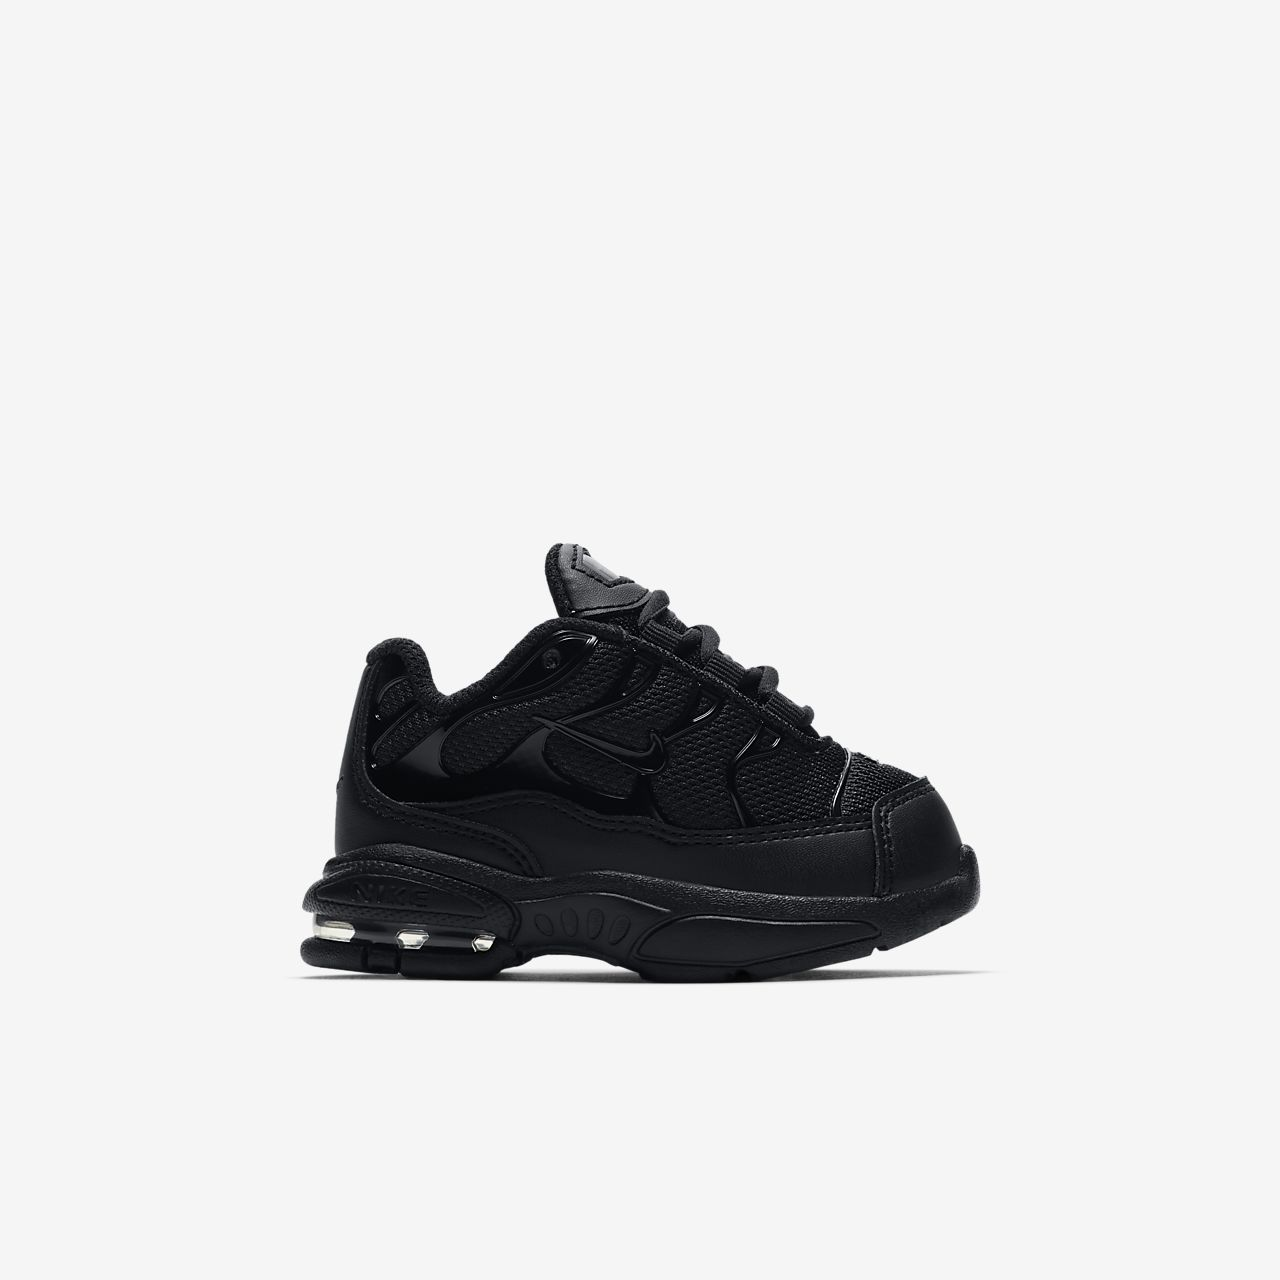 low priced 4a6ec b04f5 ... Nike Little Air Max Plus Schoen voor baby s peuters